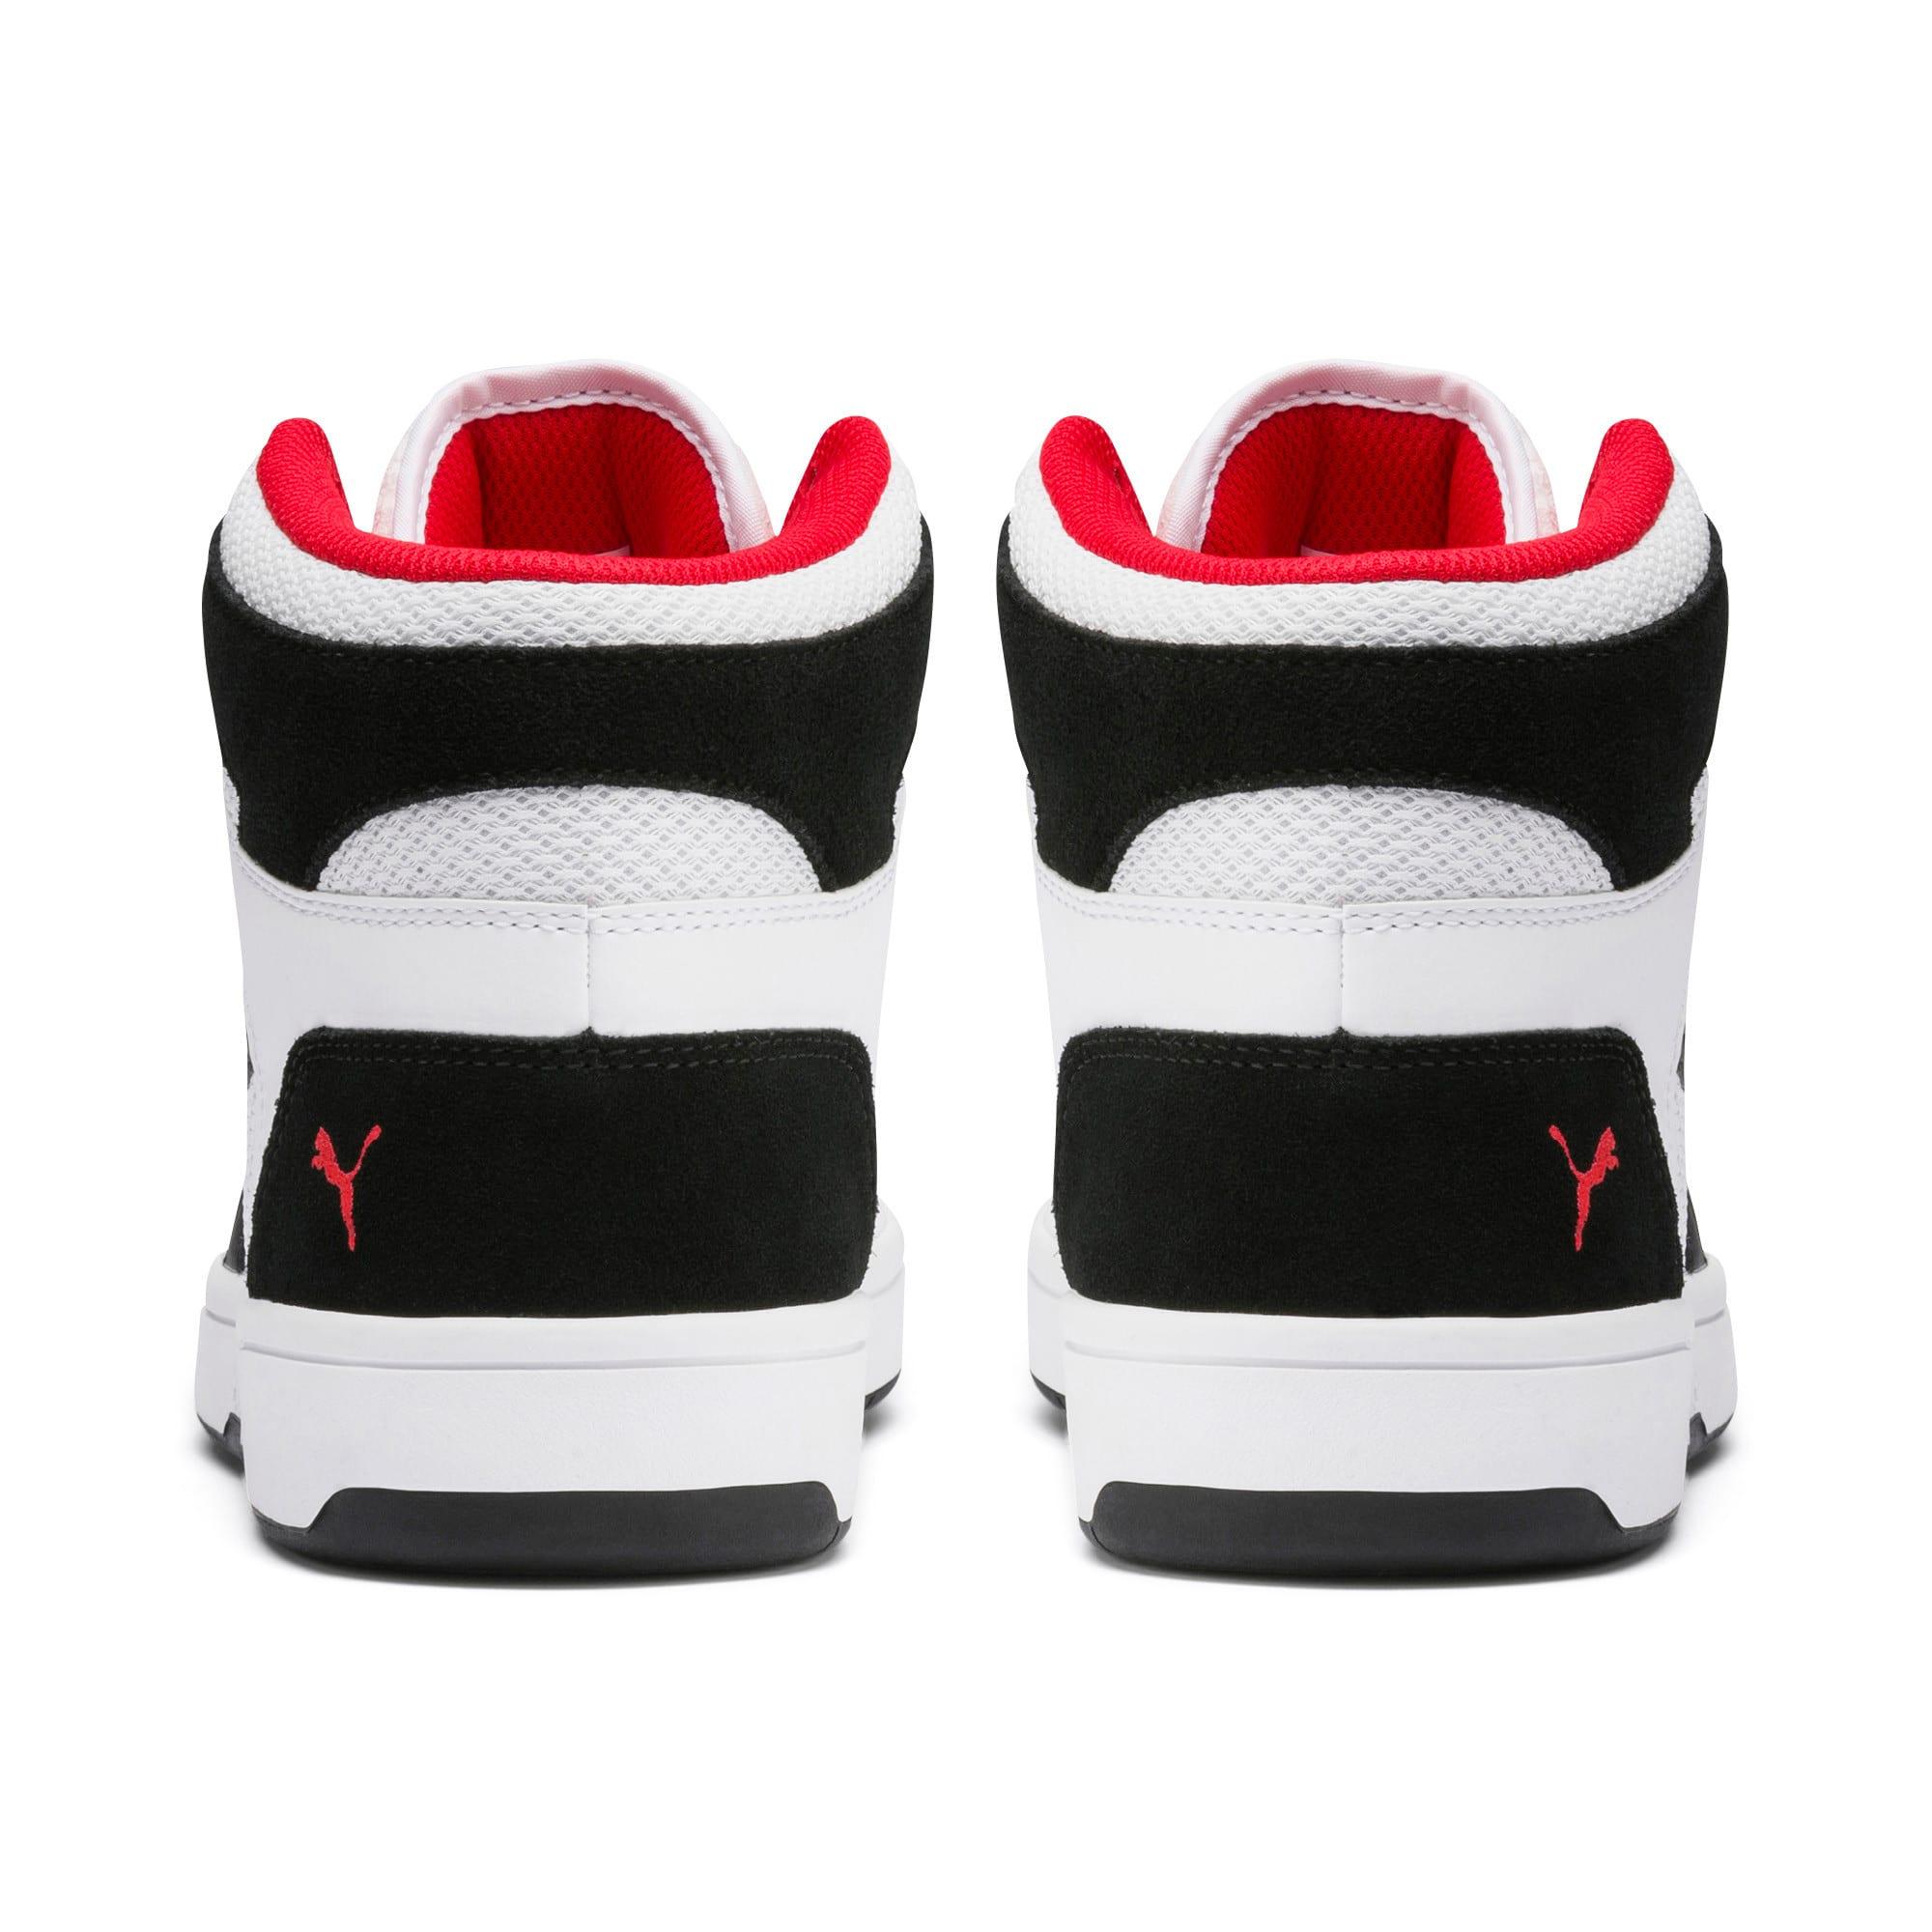 Thumbnail 3 of PUMA Rebound LayUp Mesh Sneakers, White-Black-High Risk Red, medium